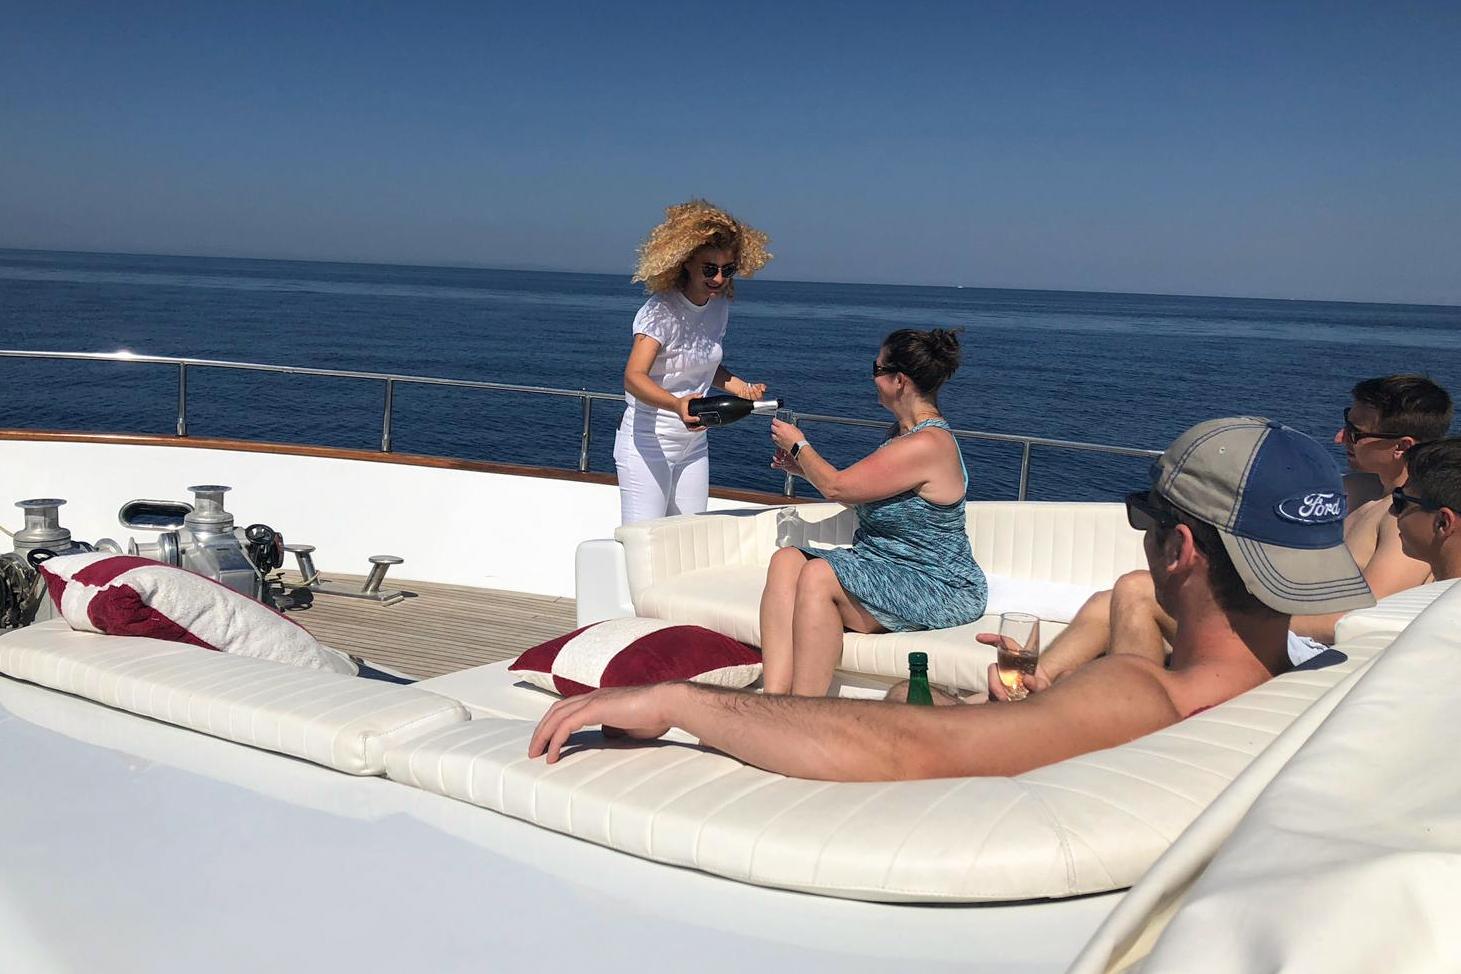 Naviga verso nuovi orizzonti con San Lorenzo Yacht